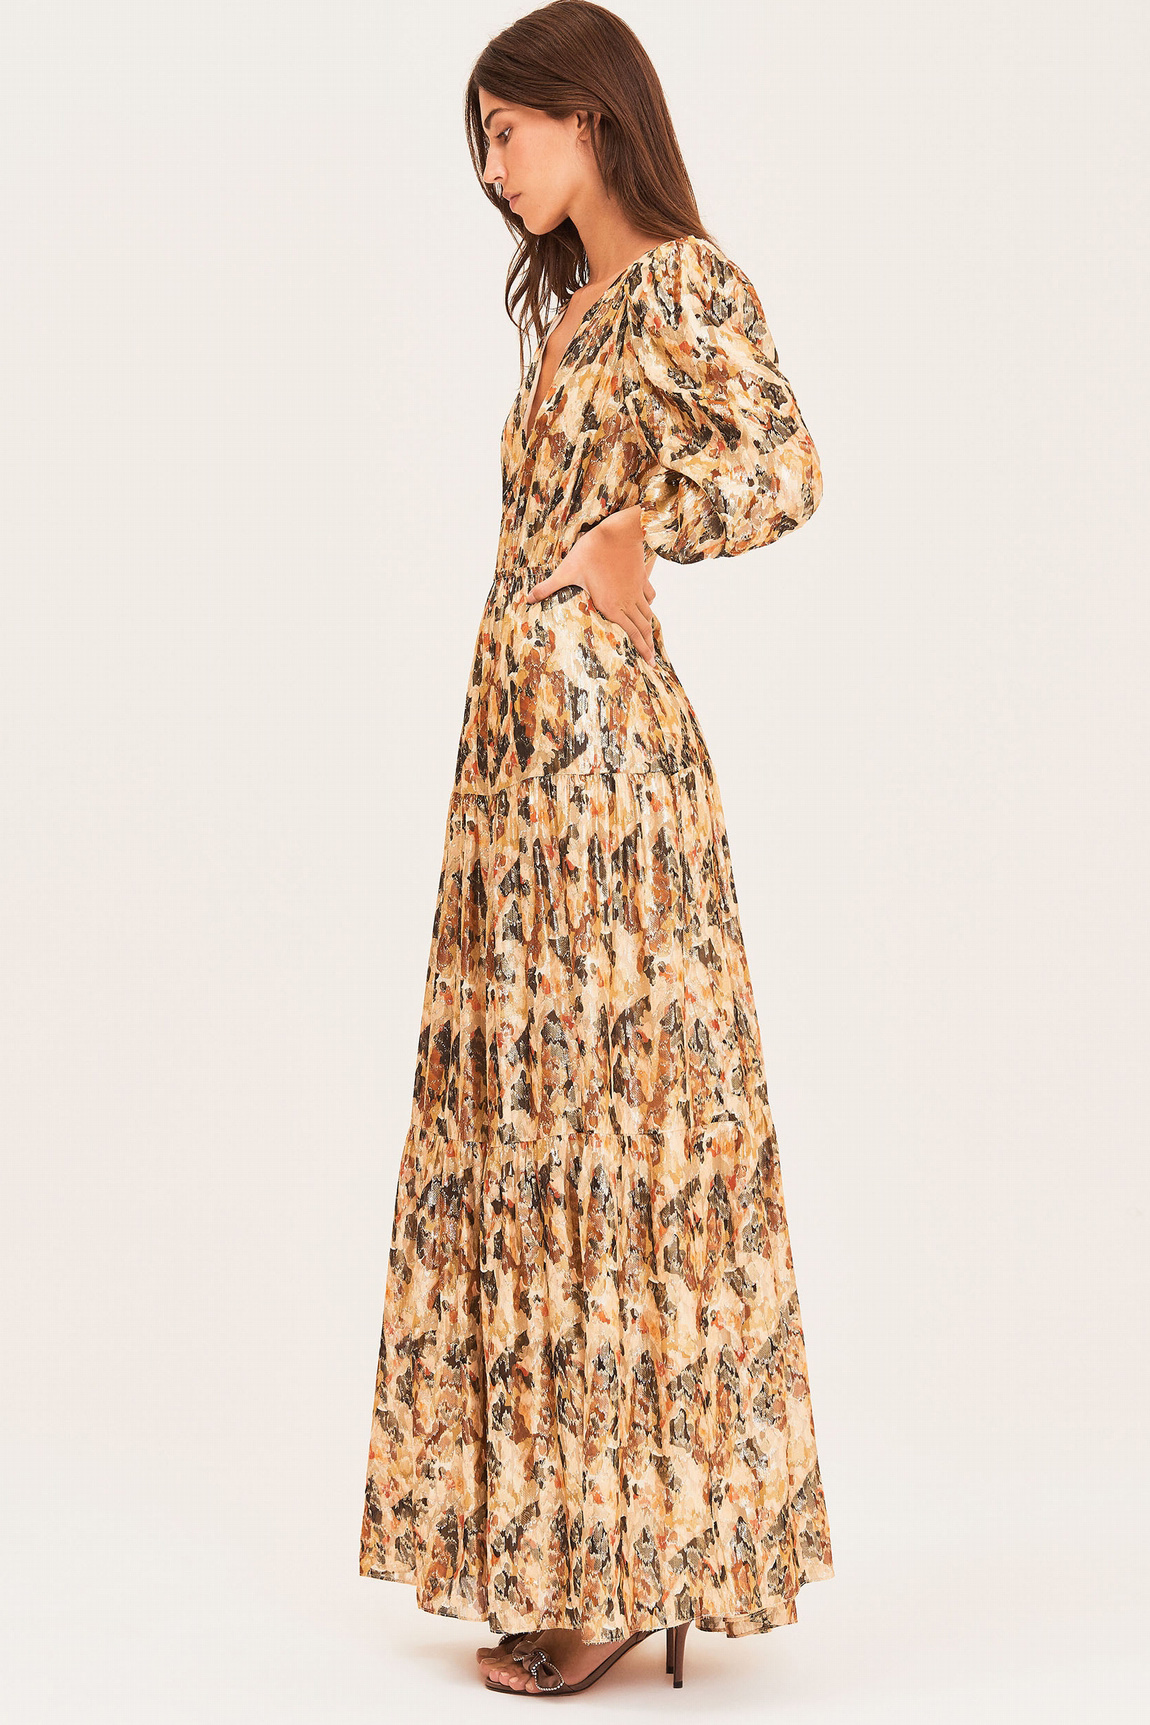 Gullian Dress - Oker-11